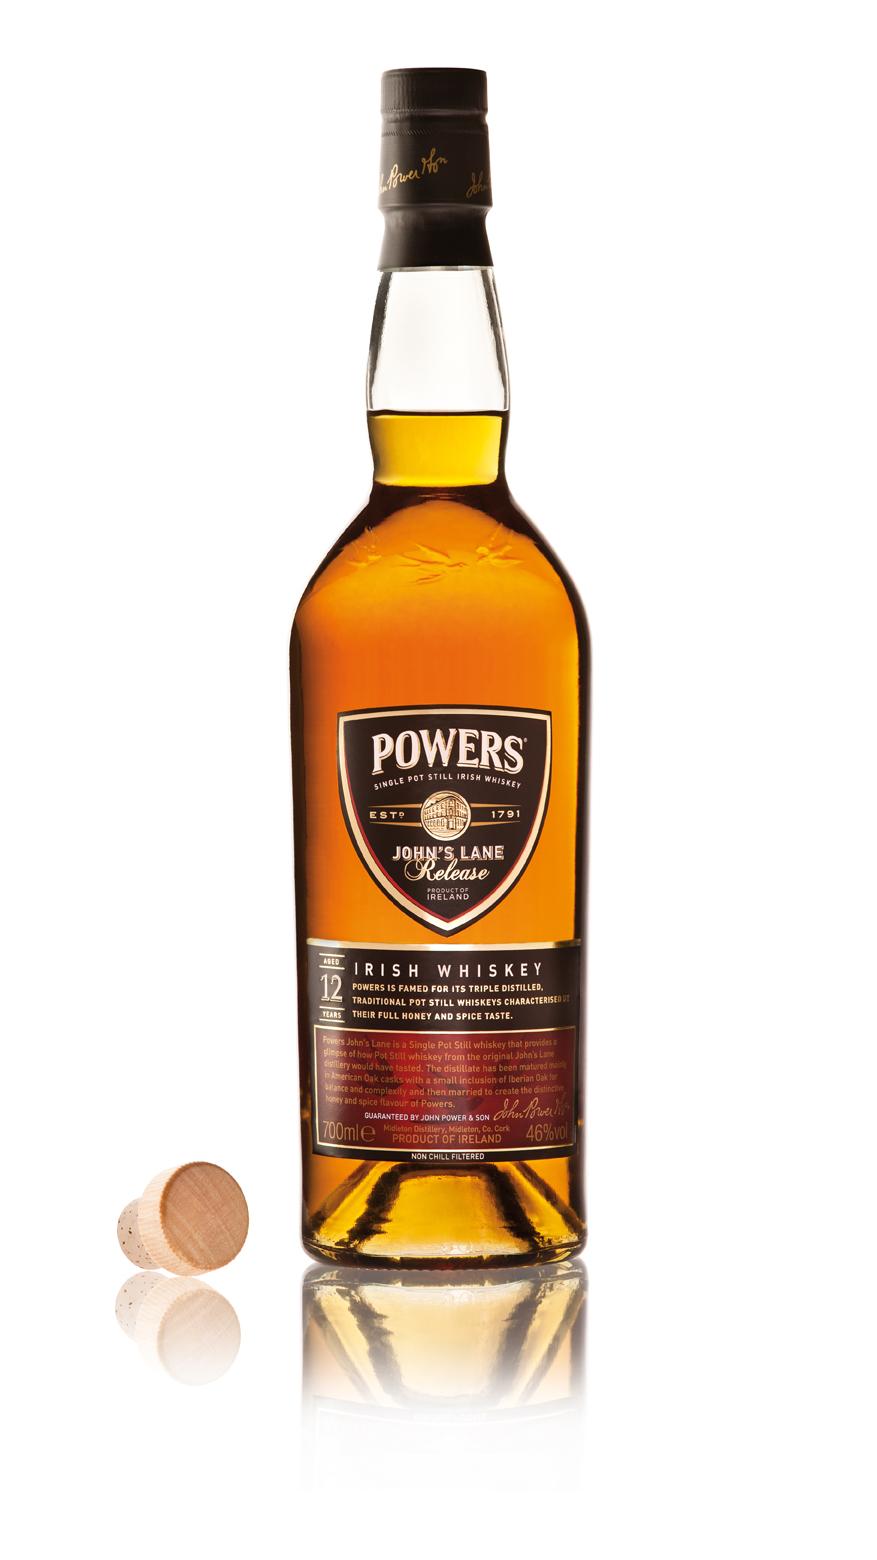 Powers John's Lane Irish Whiskey 12 Years Old